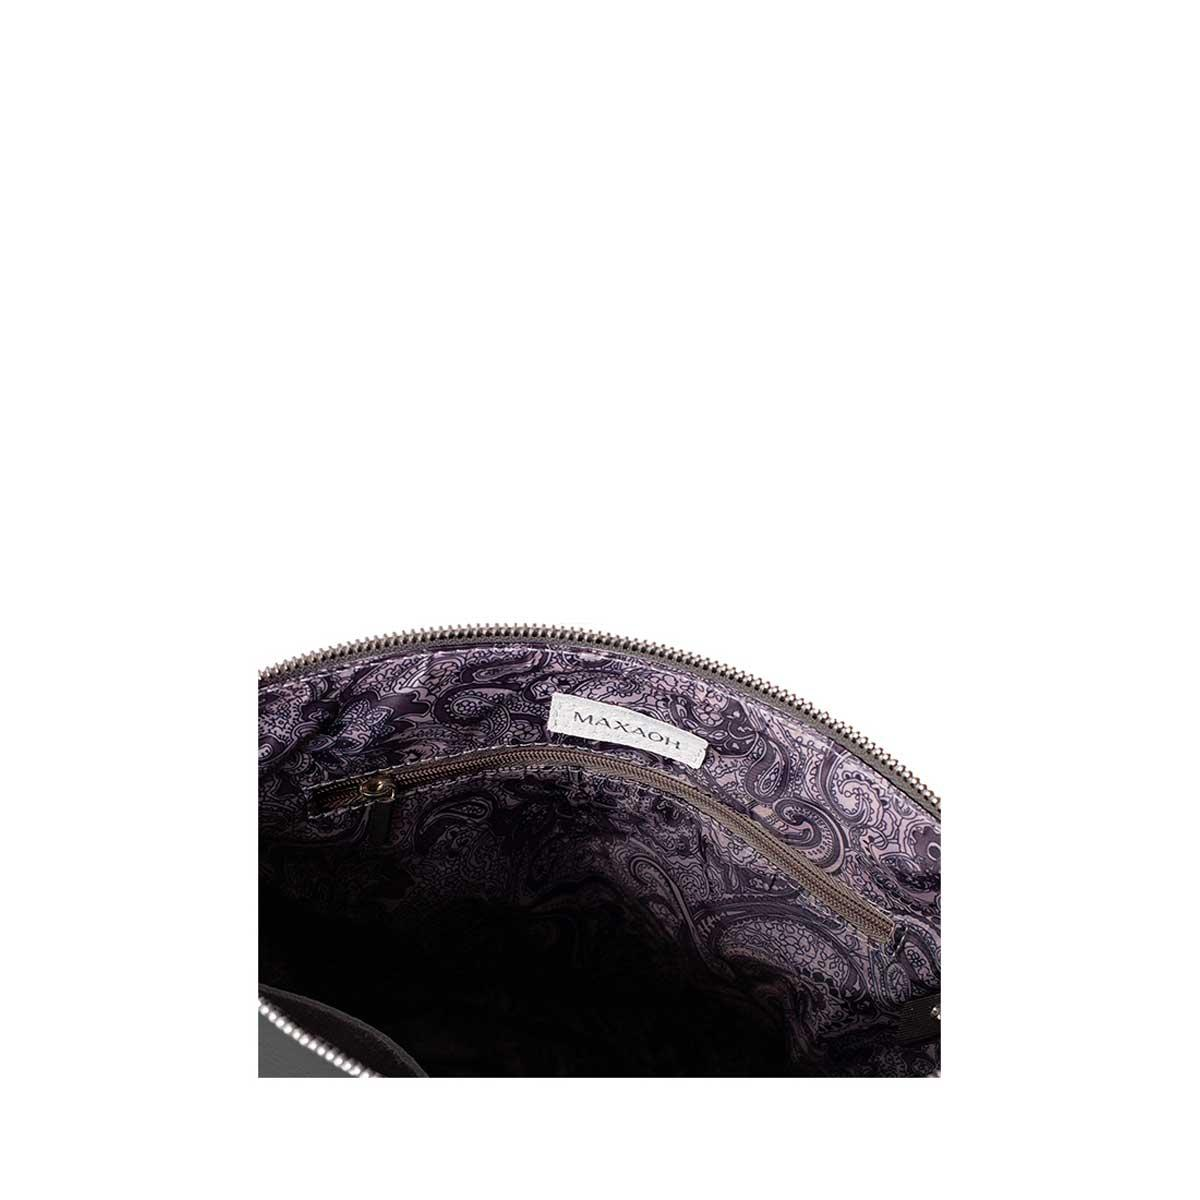 Сумка кросс-боди, BG97 «Pattern» - фото 4